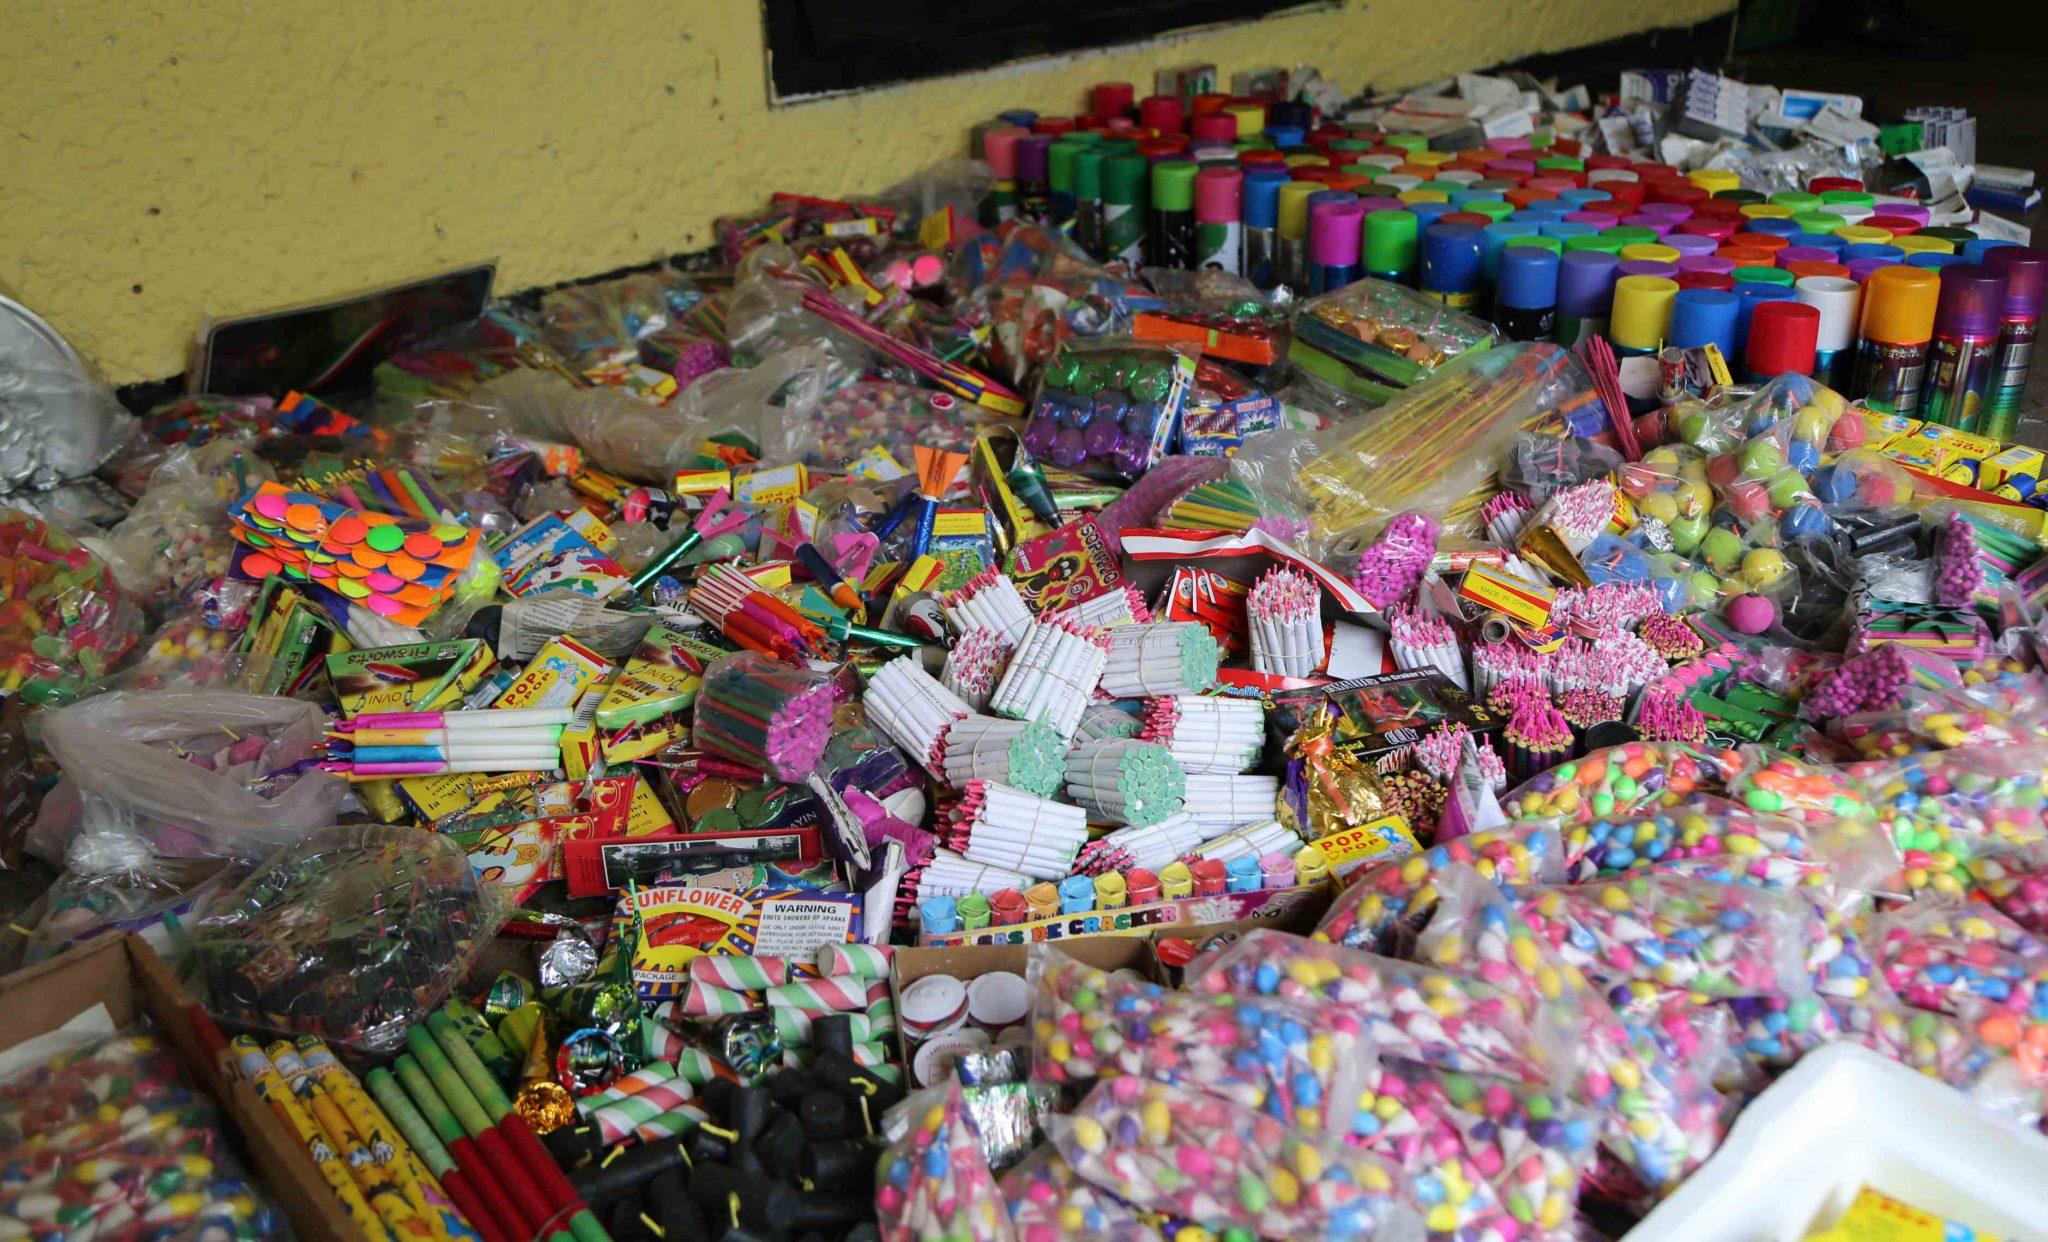 Decomisan 10 kilos de pirotecnia en San Cristobal Huichochitlán